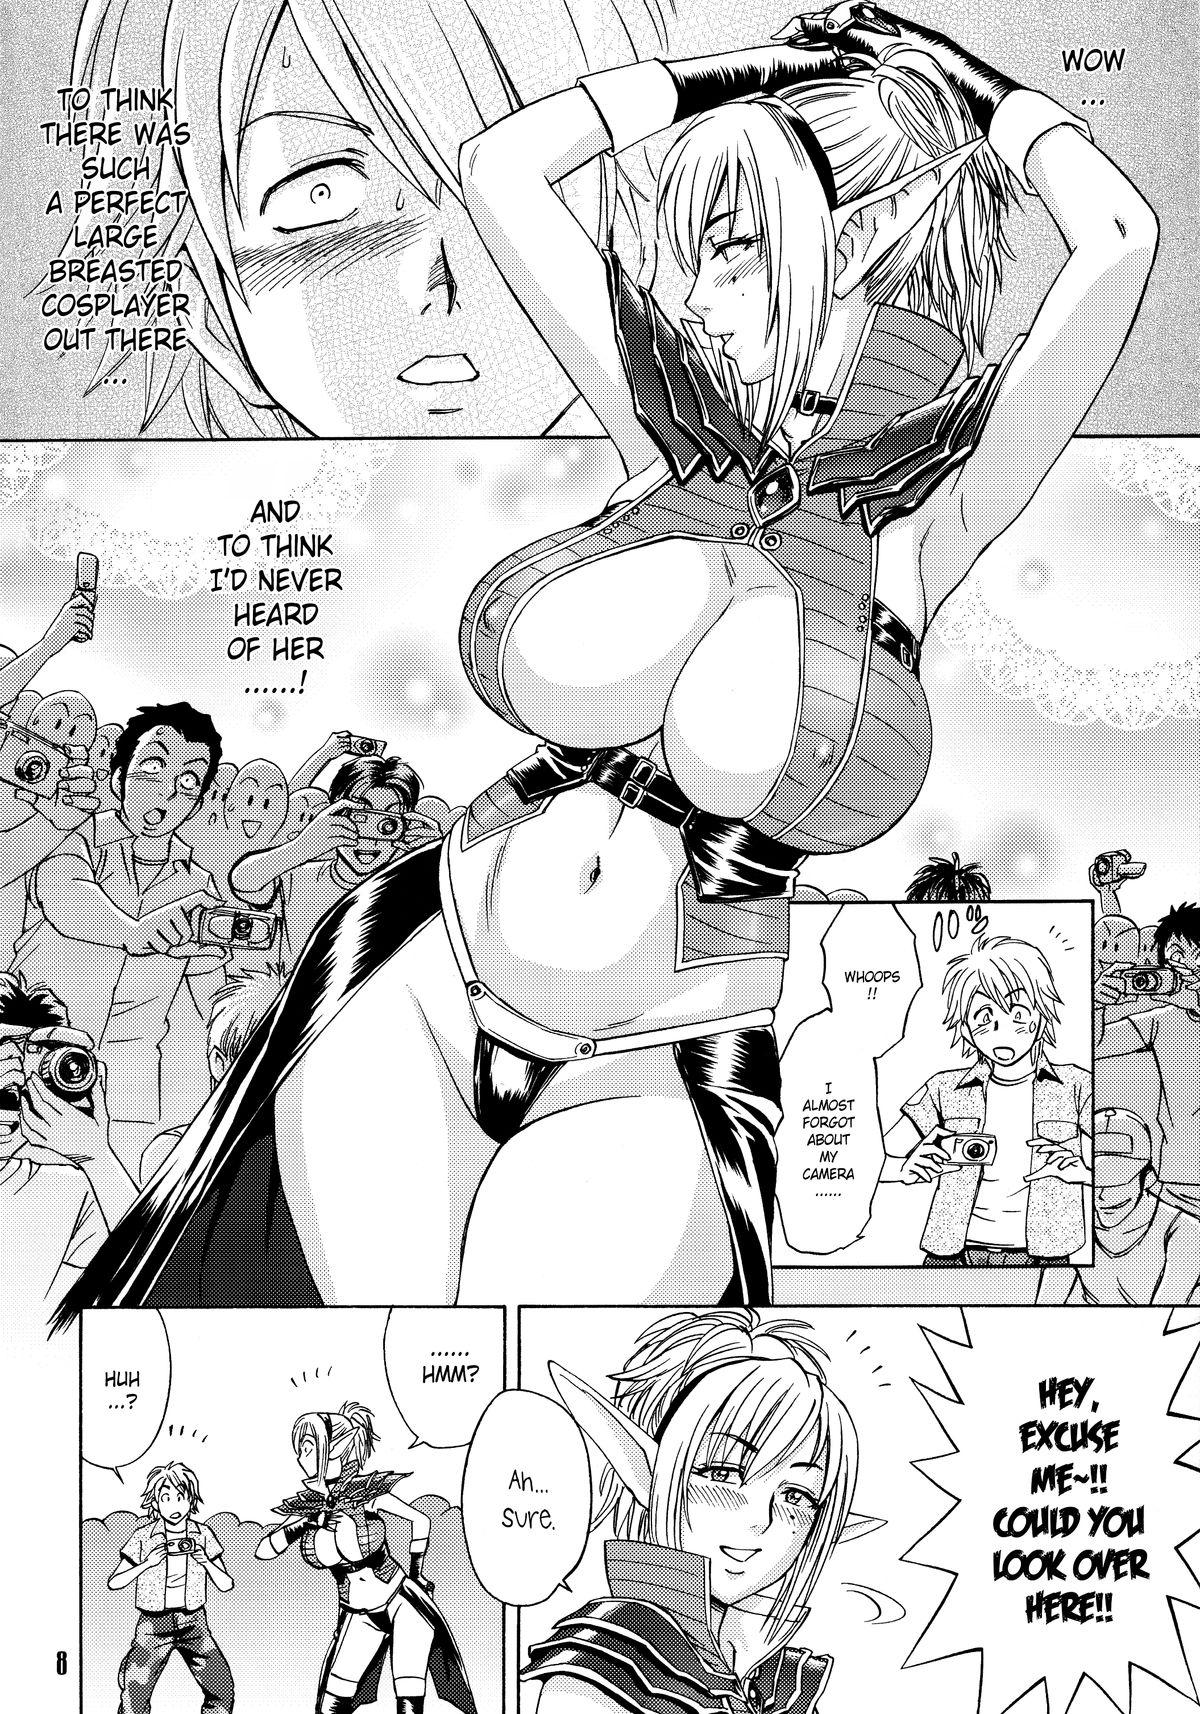 [Madam Project (Tatsunami Youtoku)] Bijin Henshuu-chou no Himitsu (1)   Beautiful Editor-in-Chief's Secret (1) [English] [Forbiddenfetish77] [Decensored] 7